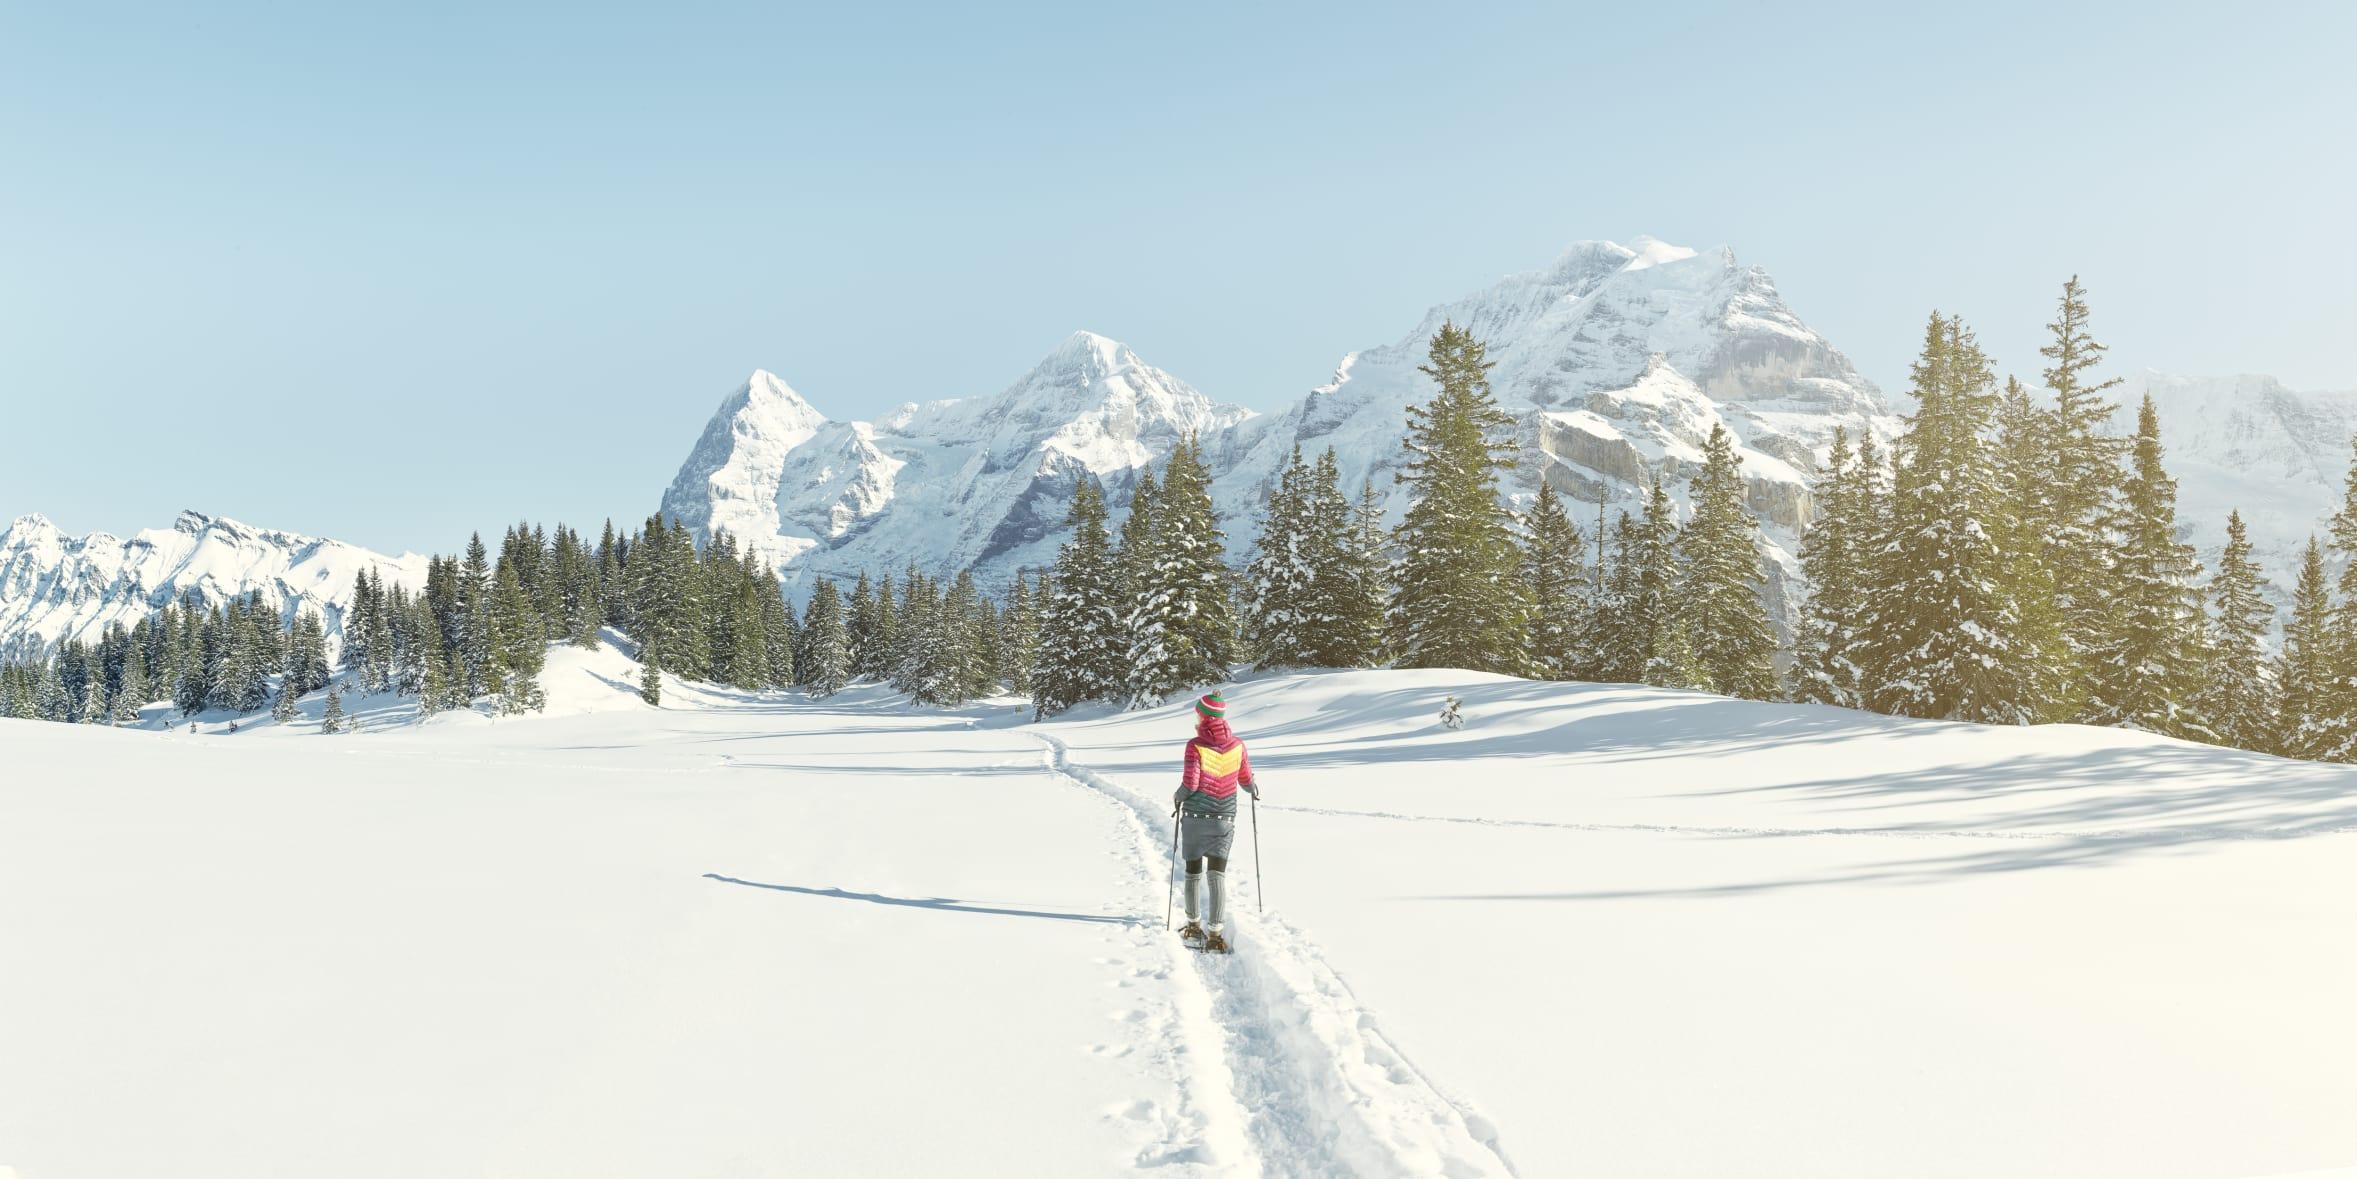 Muerren Eiger Moench Jungfrau Wandern Winter